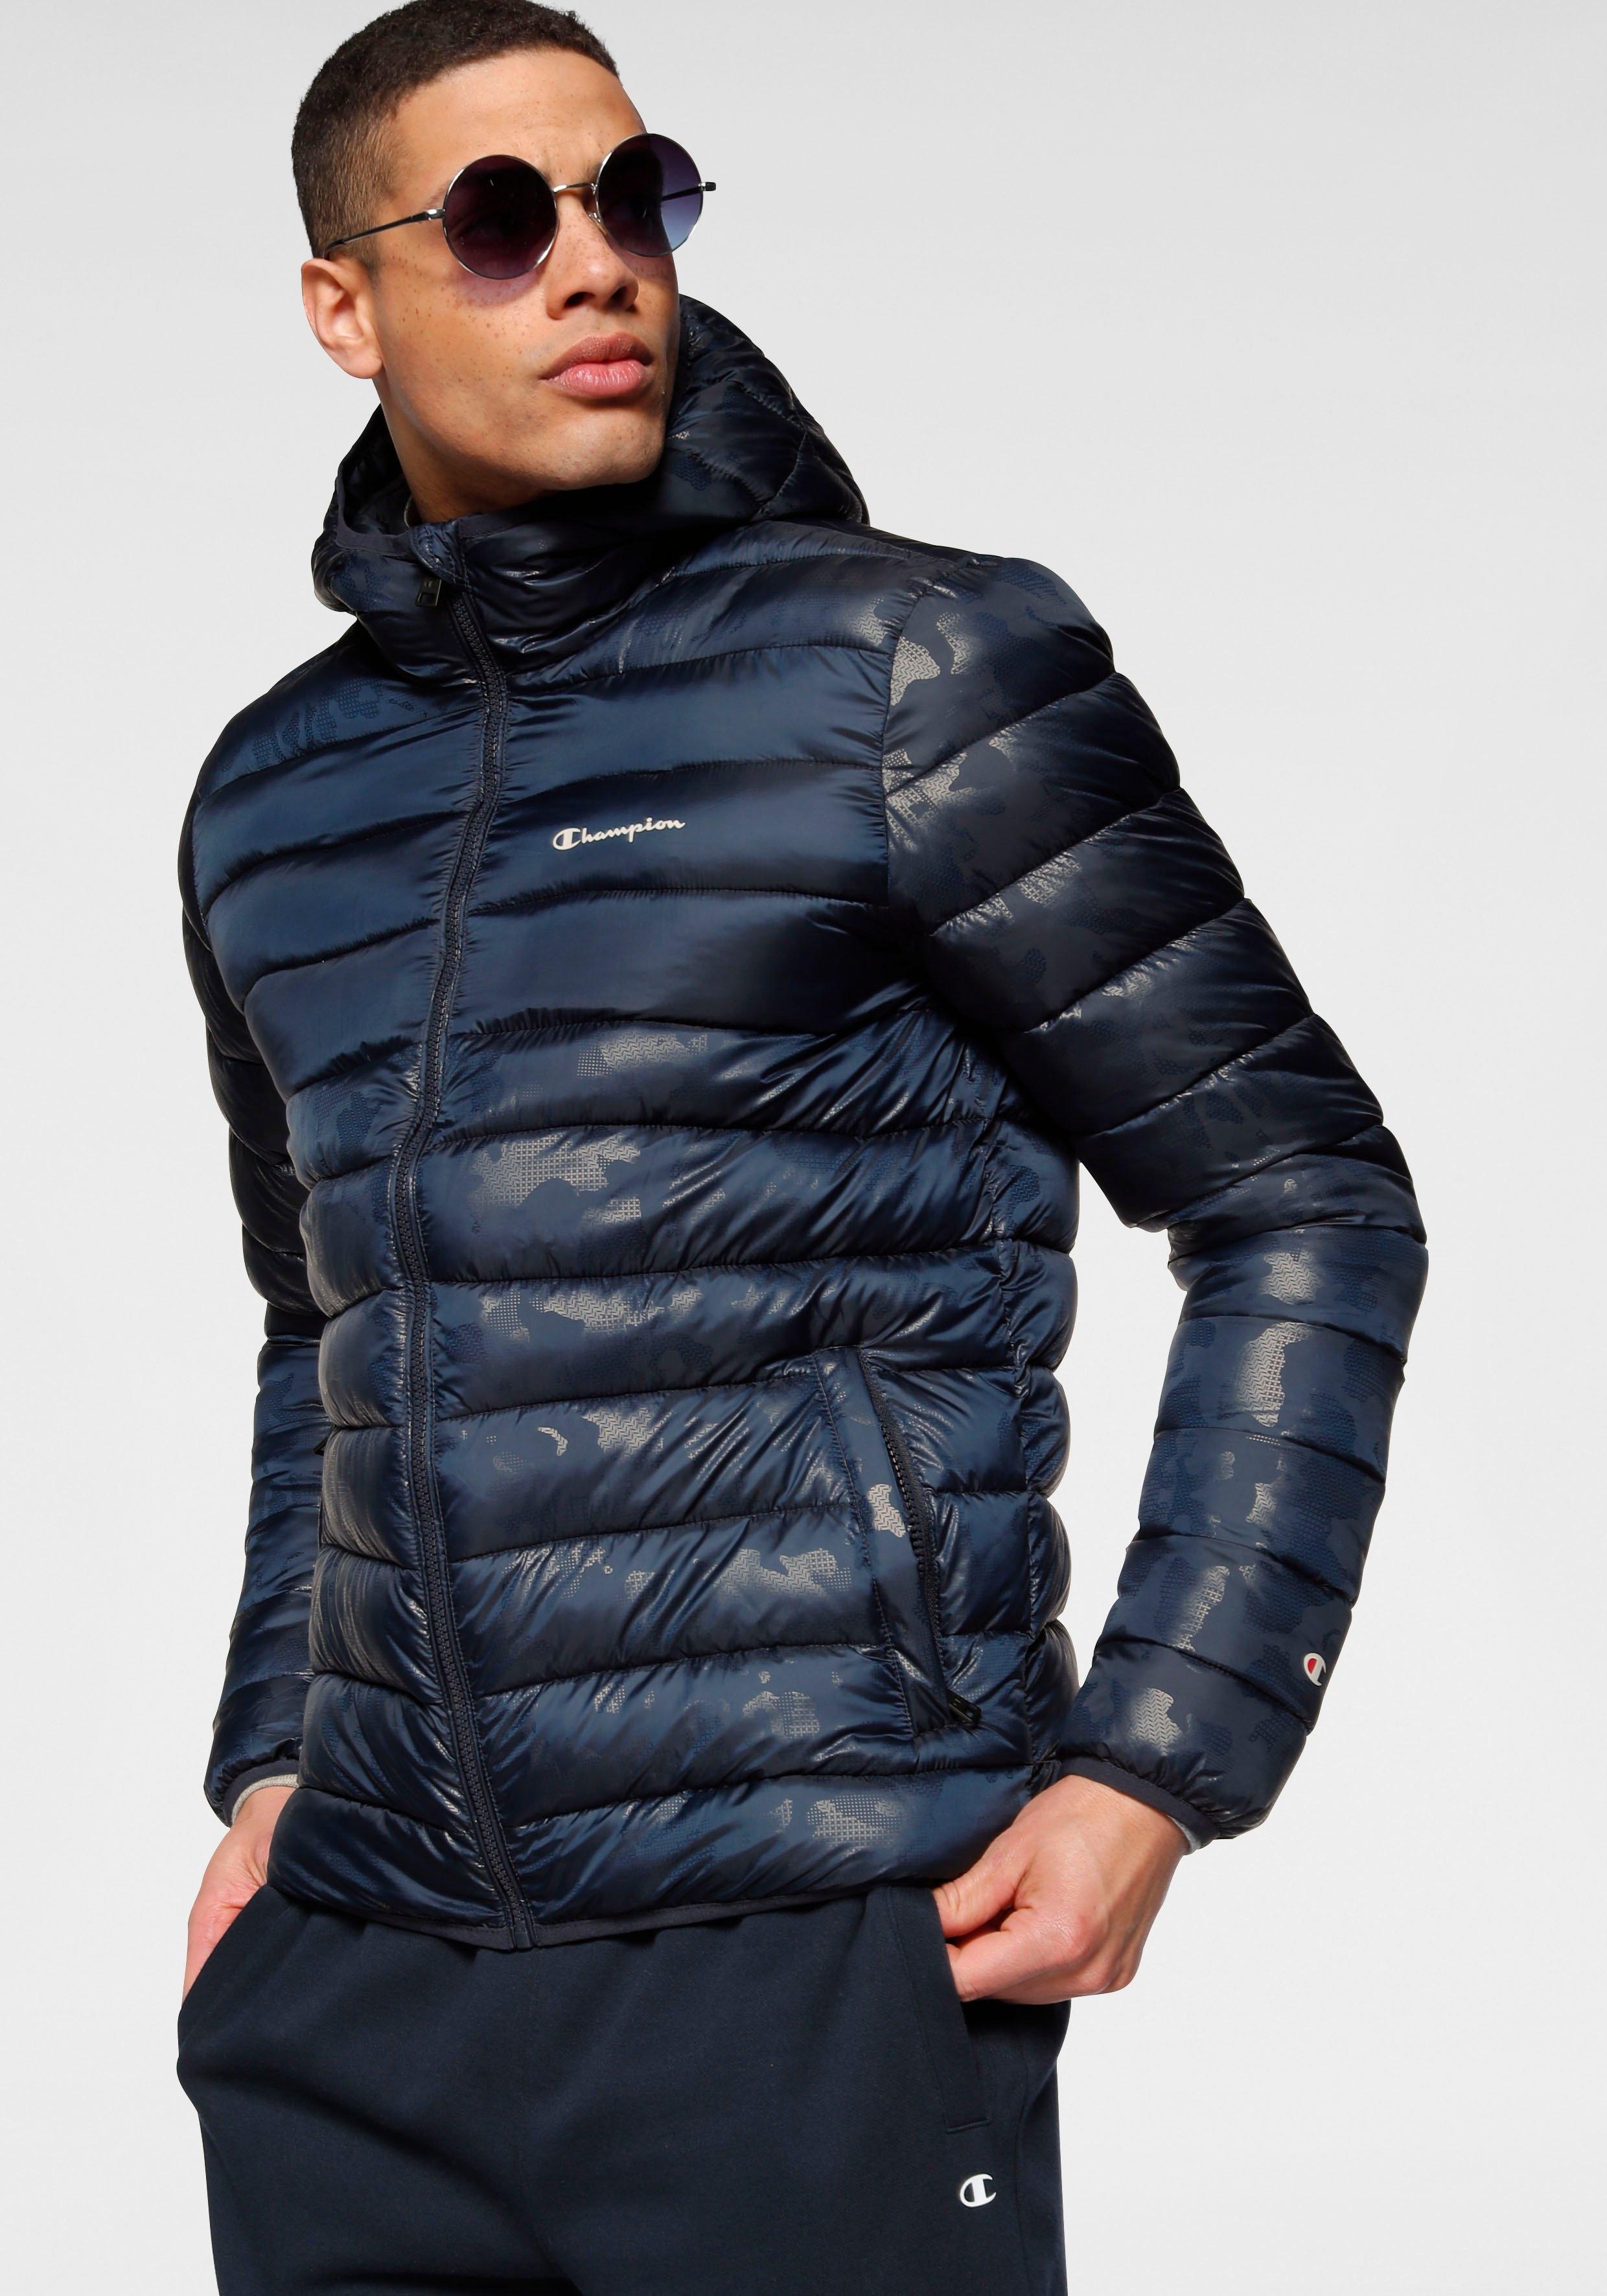 Champion gewatteerde jas HOODED JACKET nu online bestellen